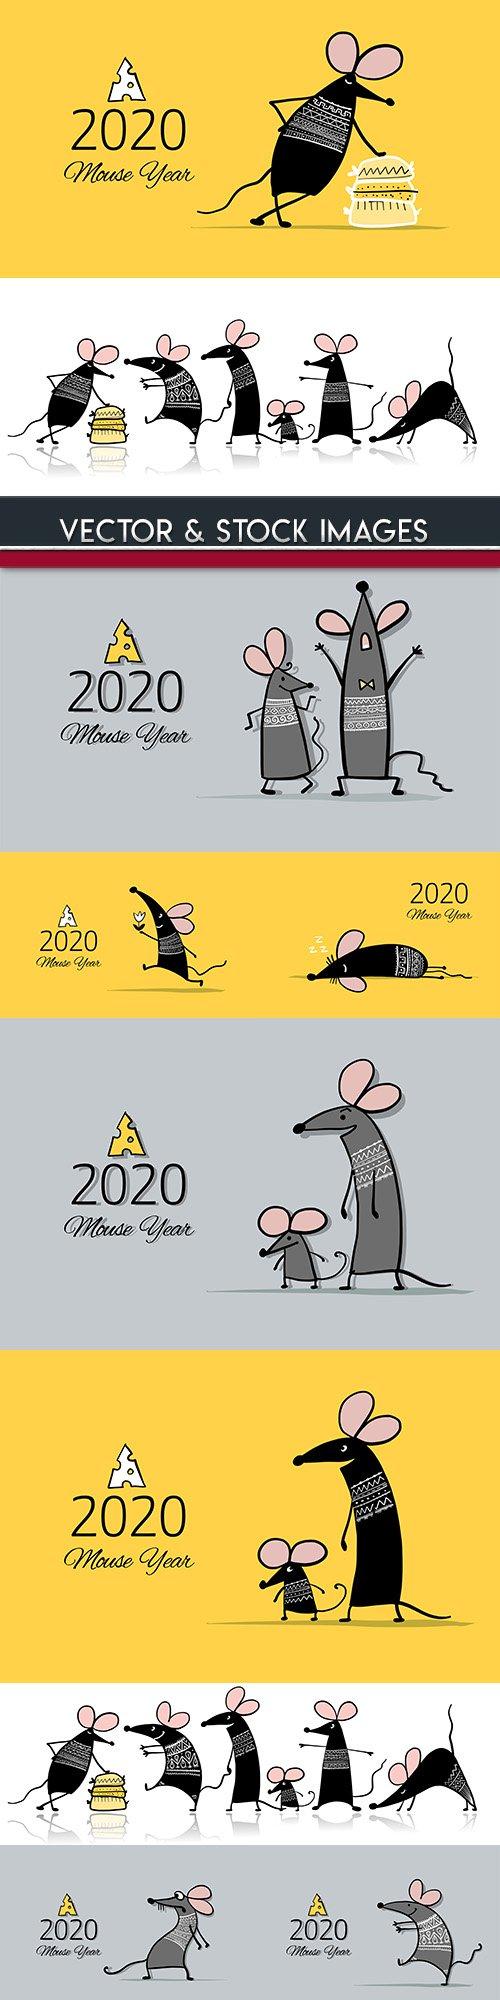 White rat symbol of New Year 2020 funny cartoon